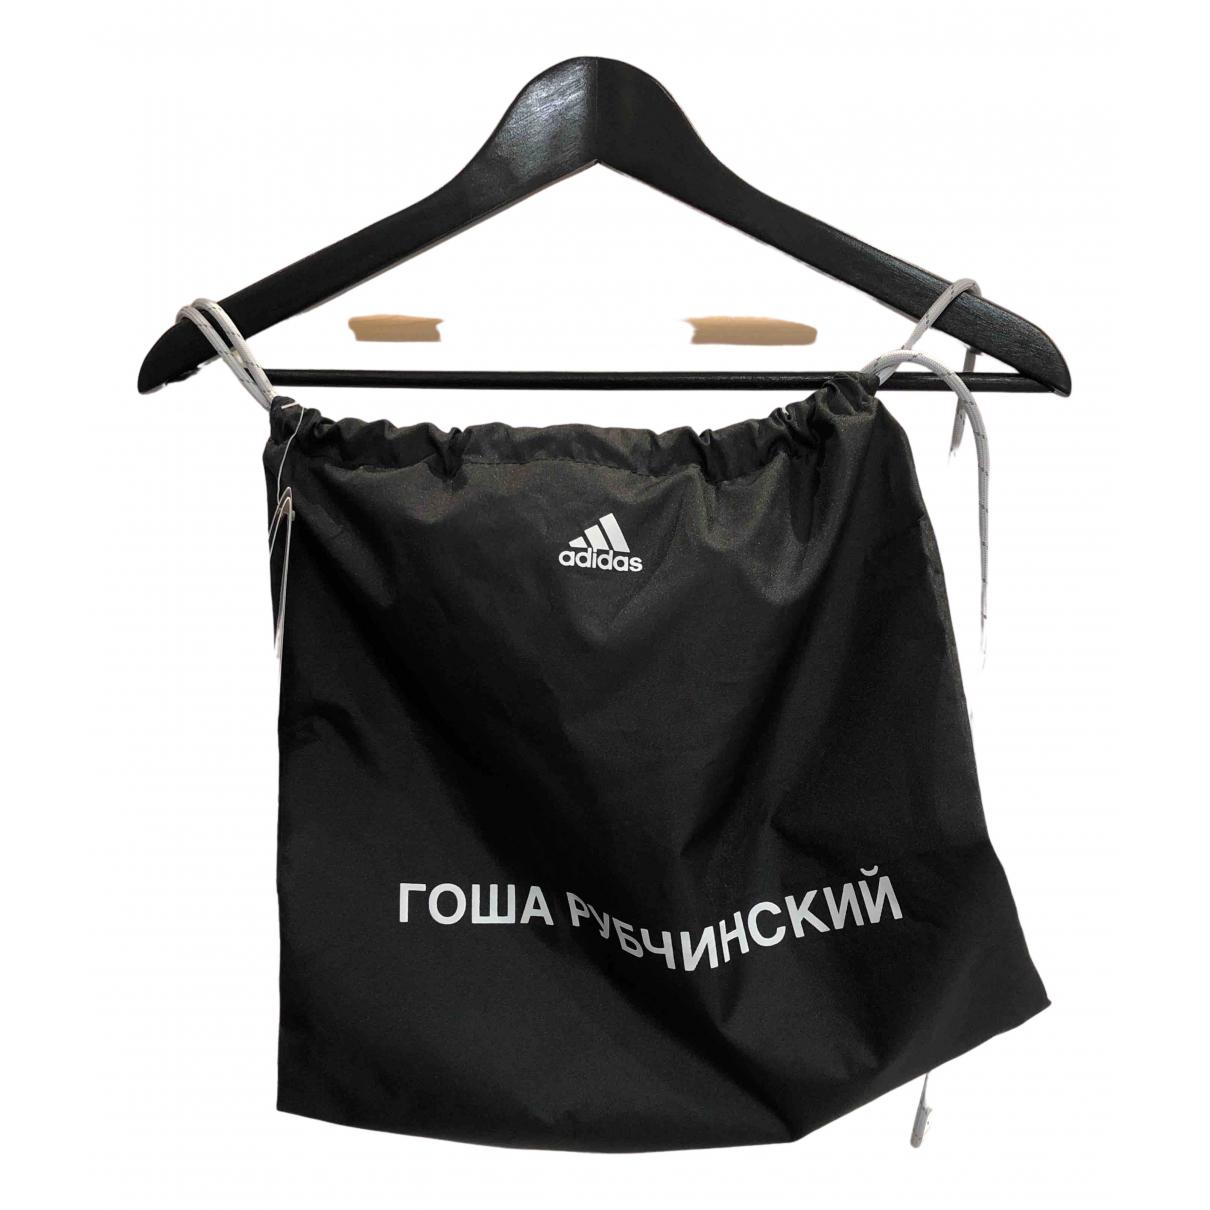 Adidas X Gosha Rubchinskiy N Black bag for Men N